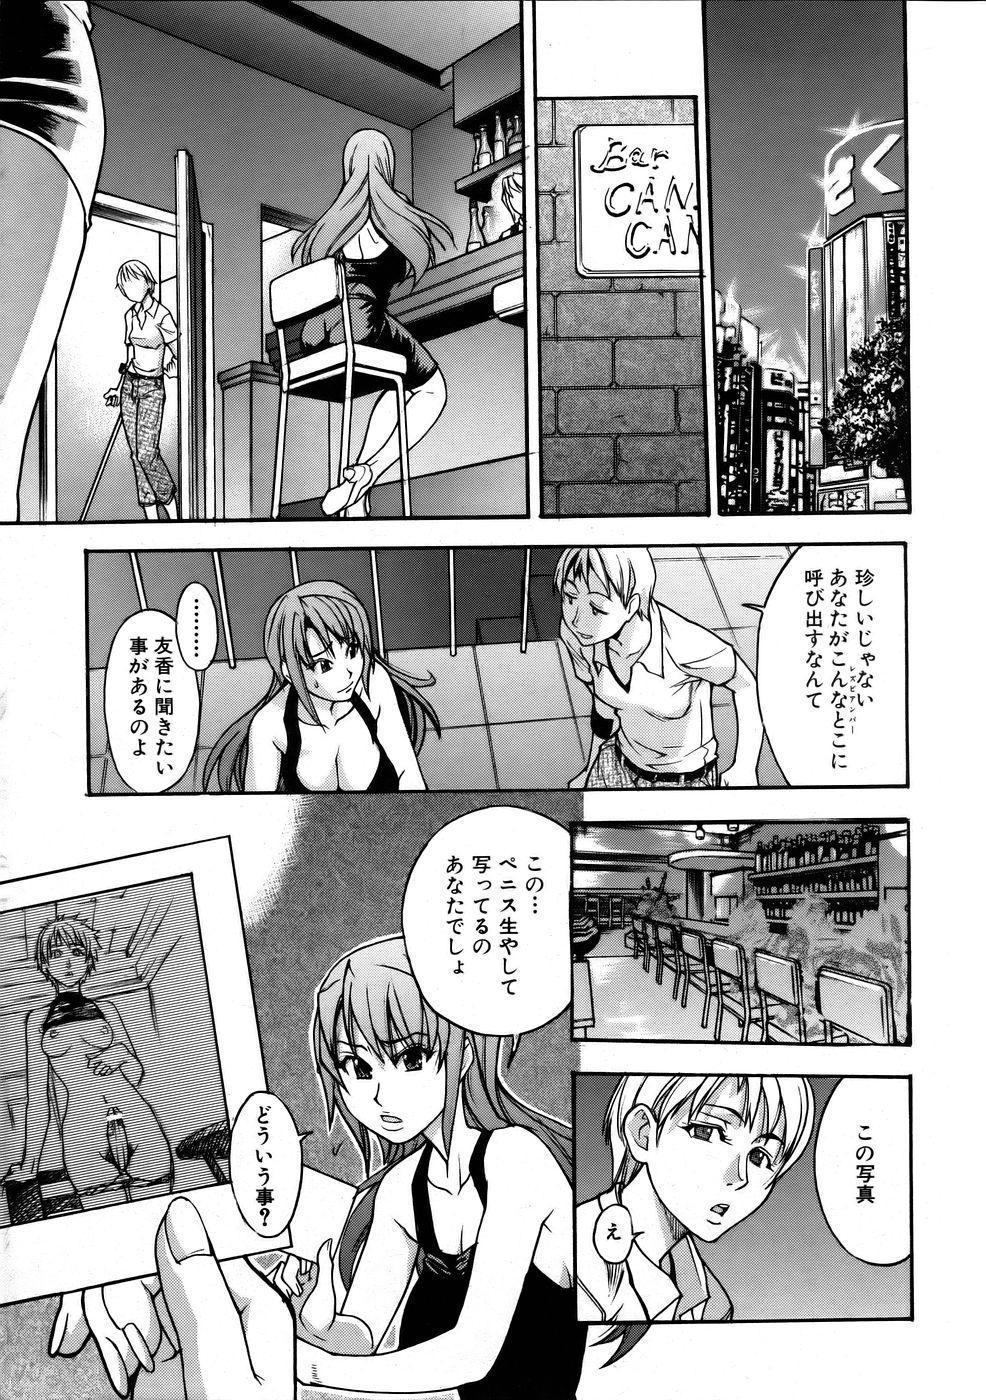 COMIC AUN 2005-10 Vol. 113 12